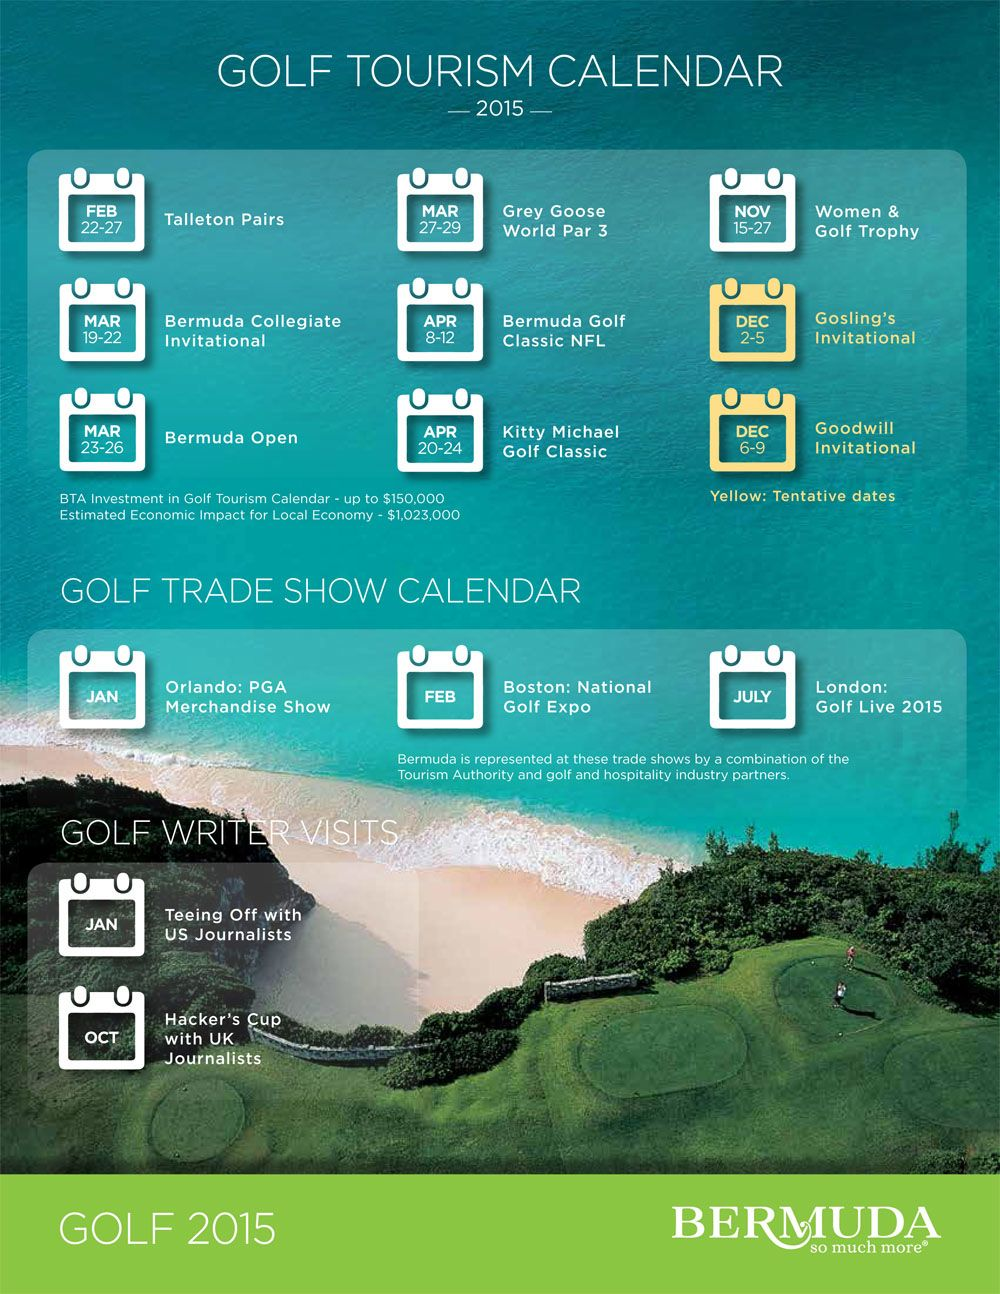 BTA_2015 Golf Calendar_sml